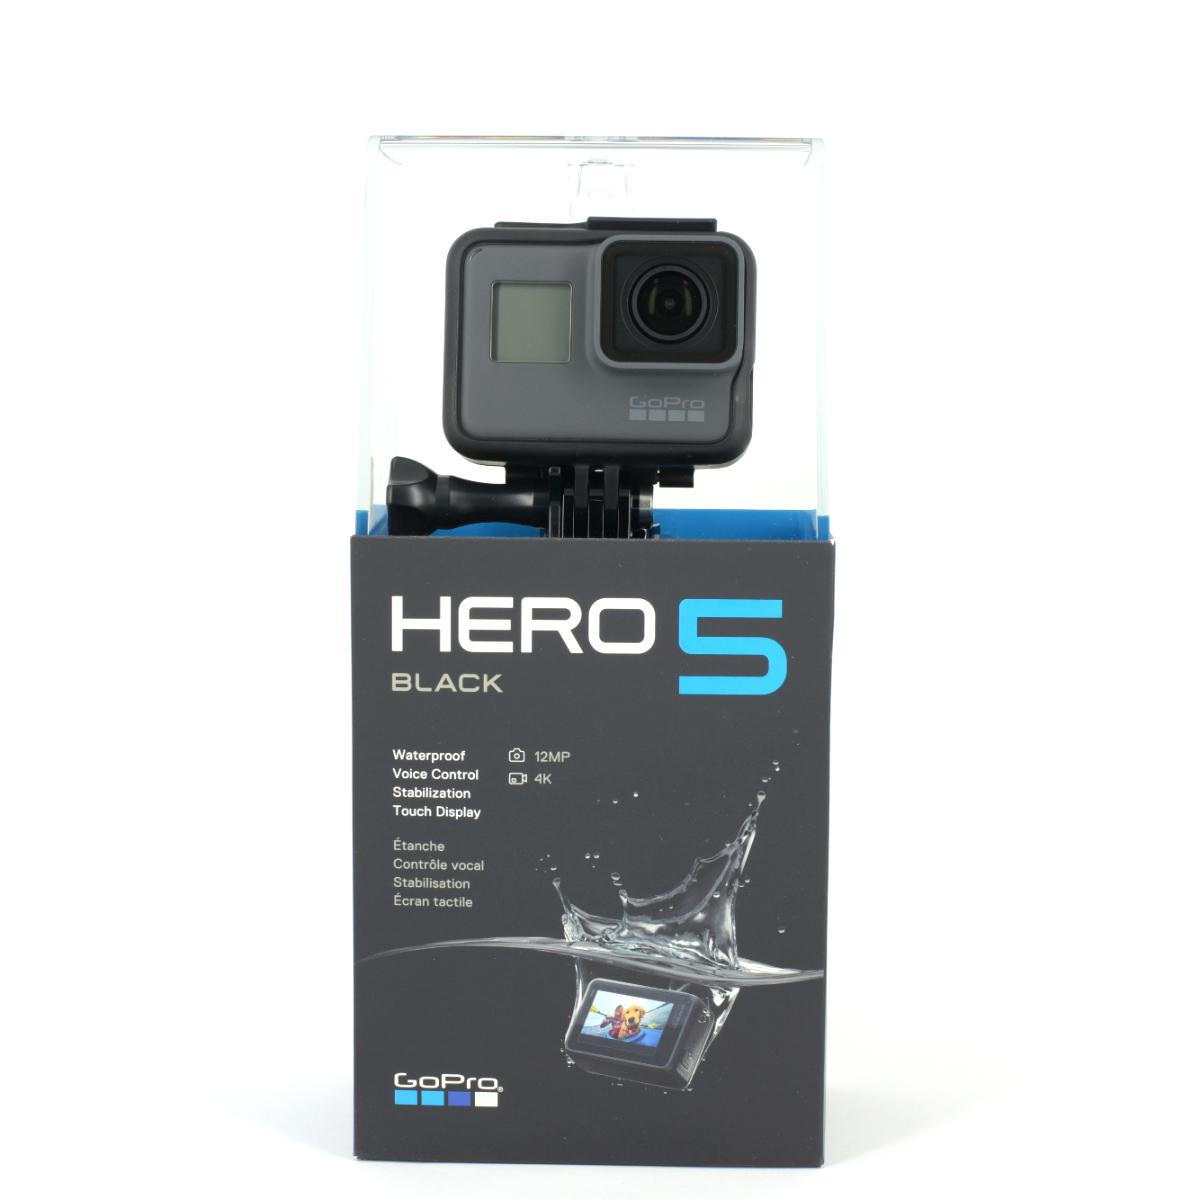 GoPro Hero 5 Black £240 @ eglobalcentral